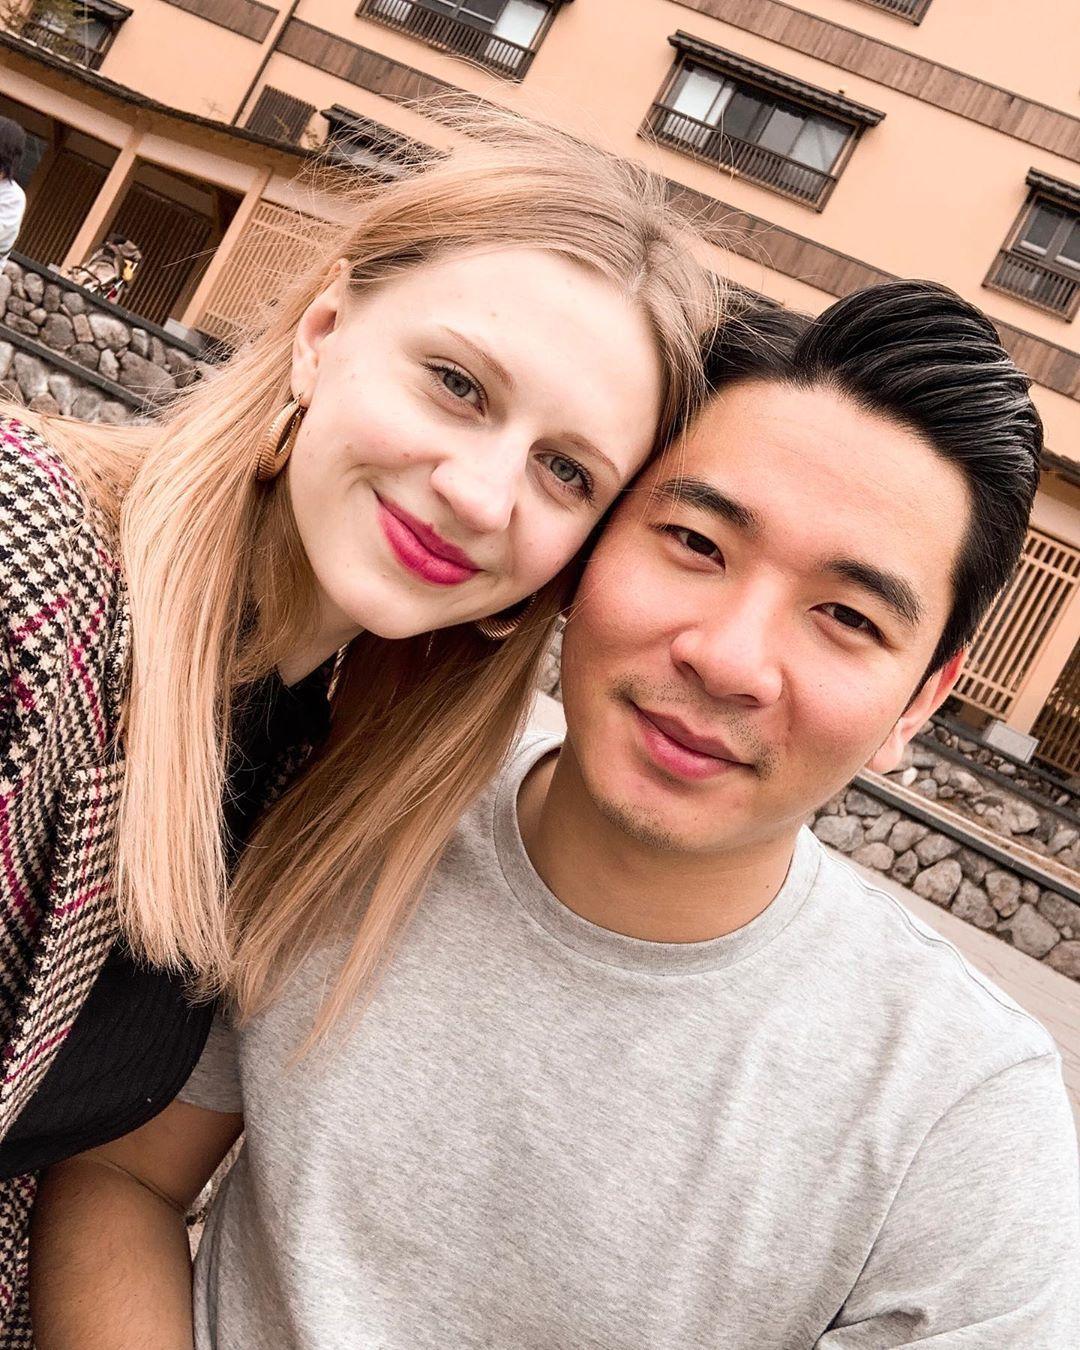 Asian guy dating white girl updating microsoft sync